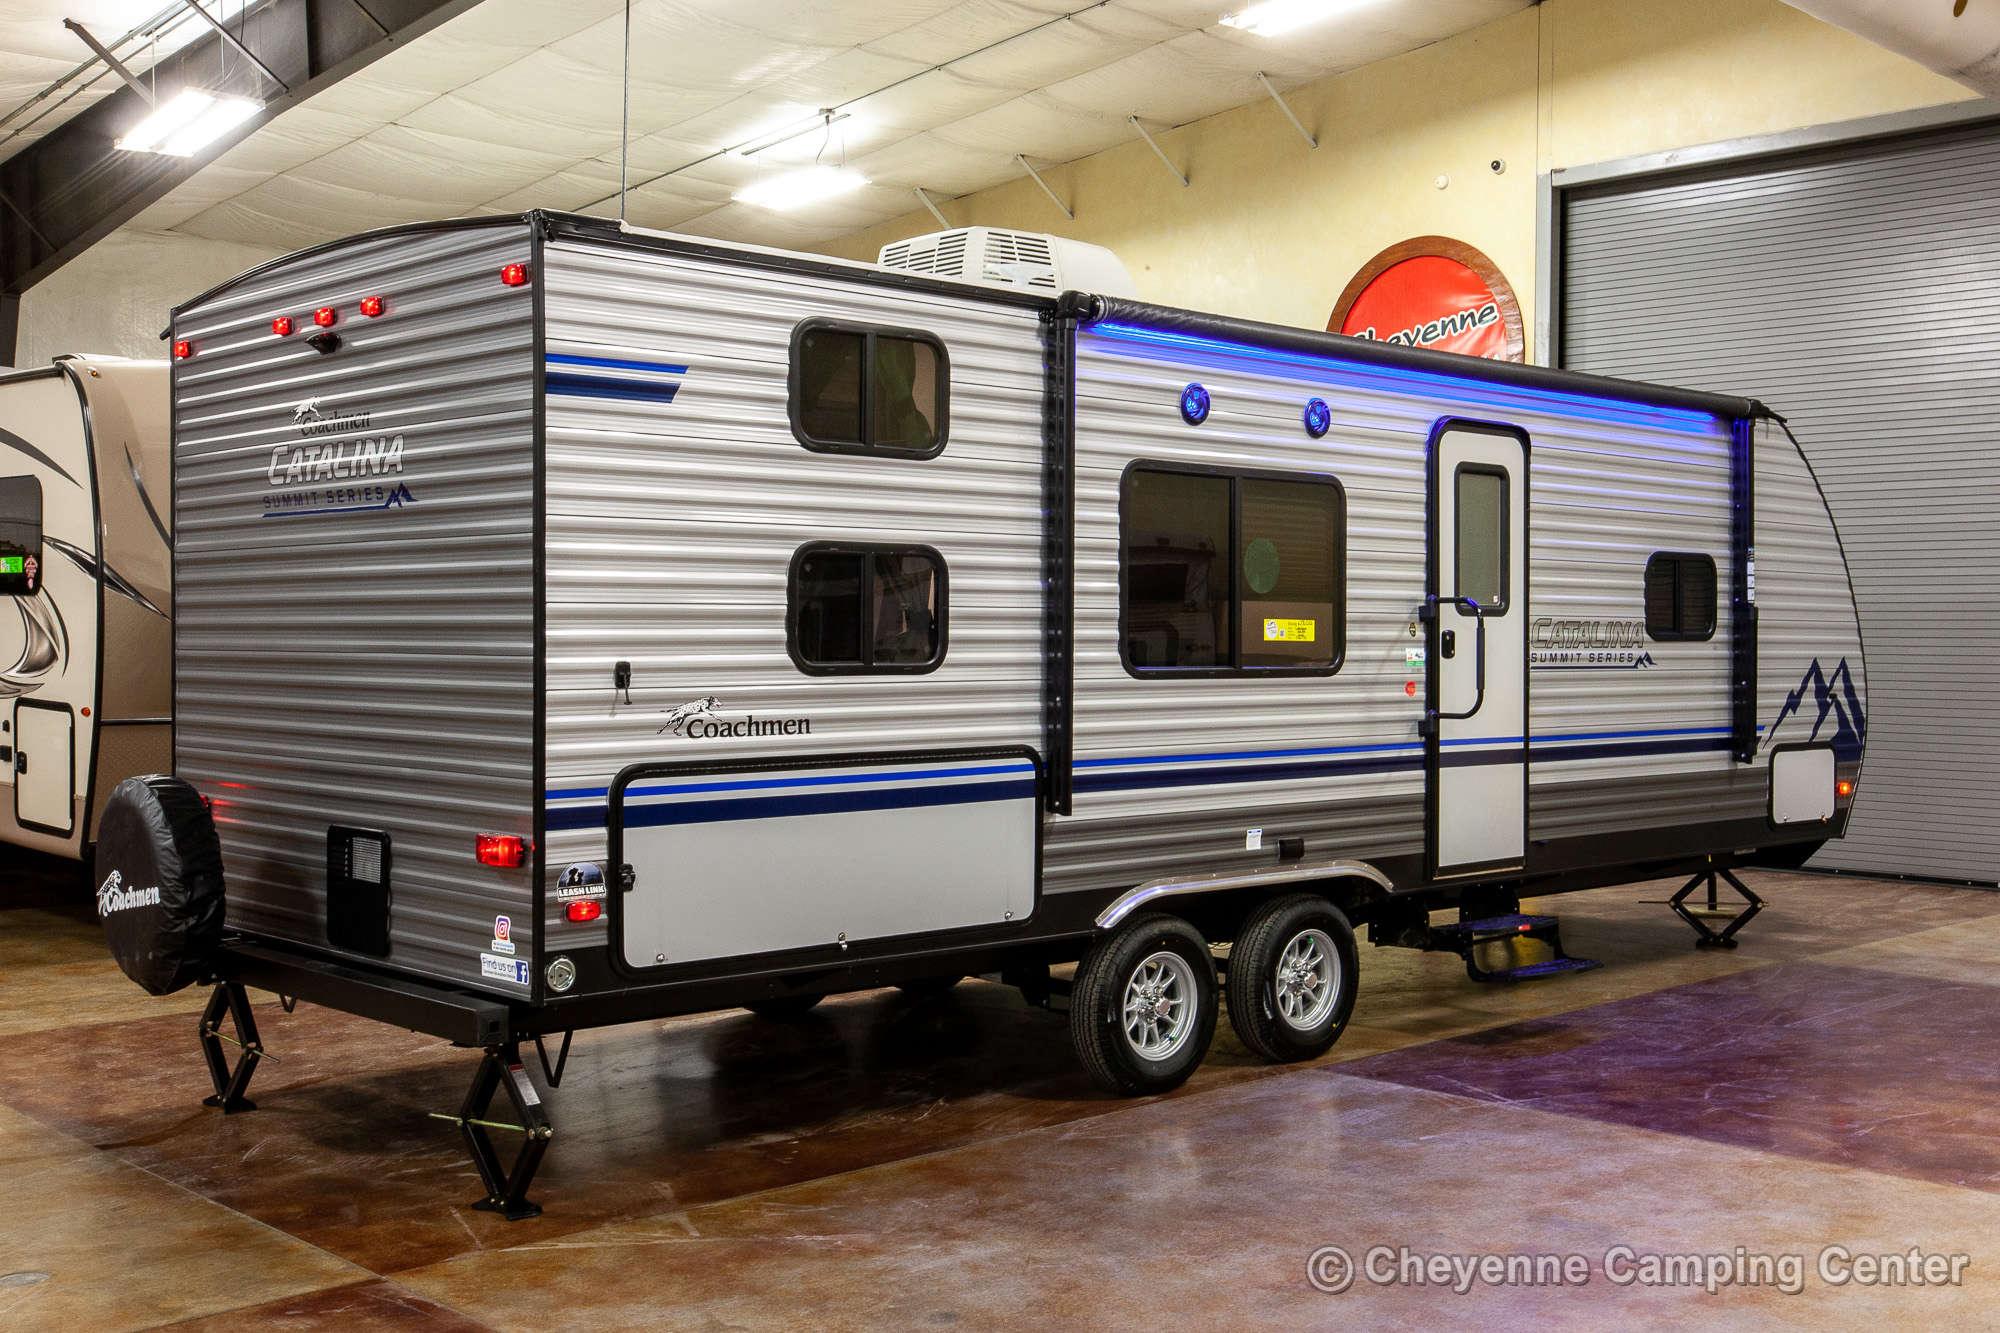 2020 Coachmen Catalina Summit Series 261BH Bunkhouse Travel Trailer Exterior Image